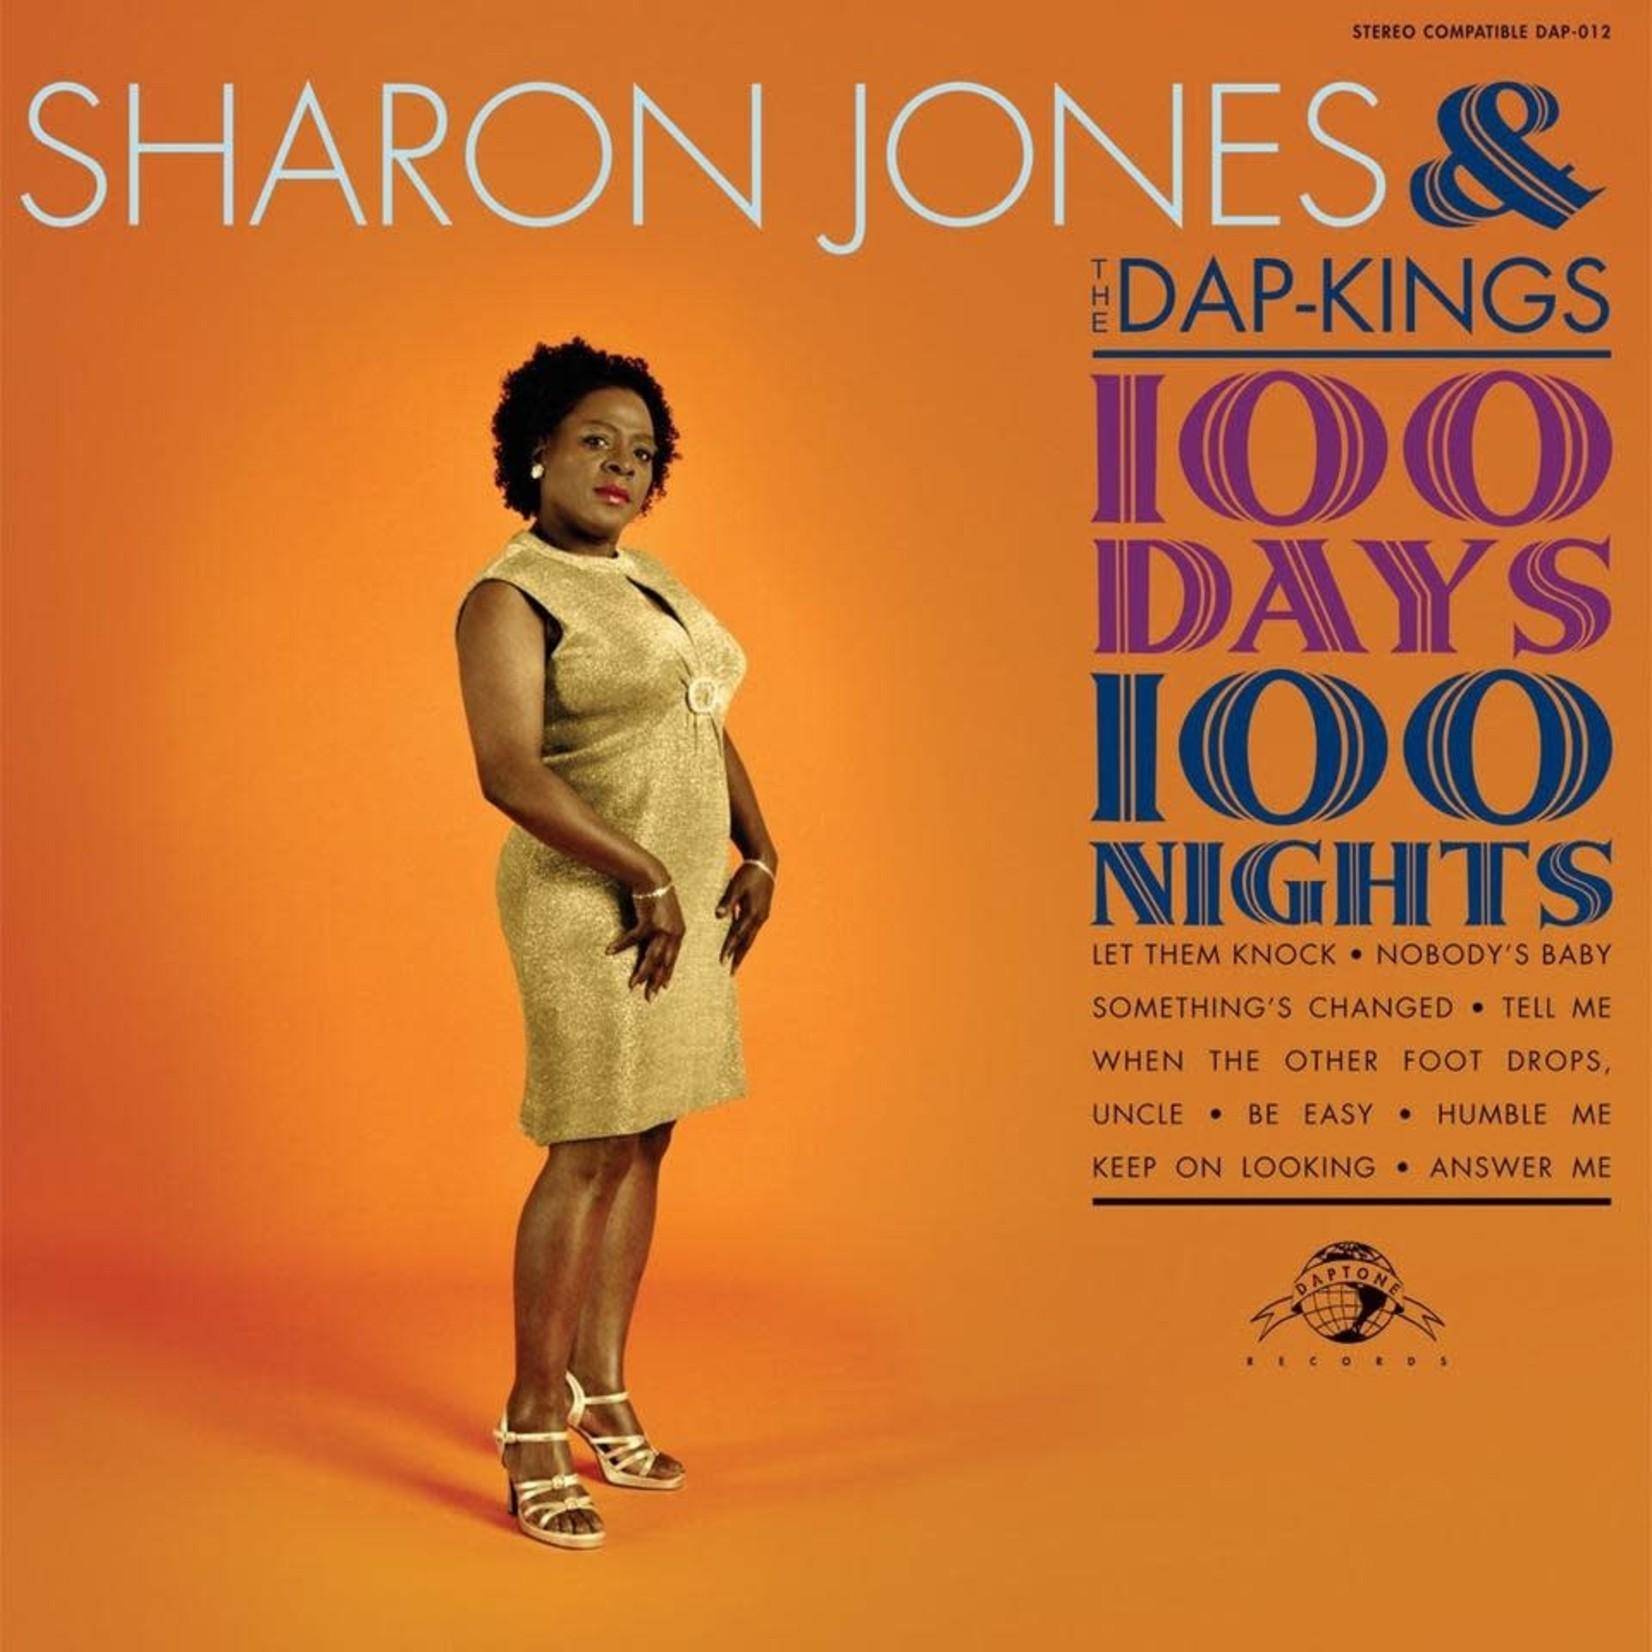 [New] Jones, Sharon & the Dap-Kings: 100 Days, 100 Nights